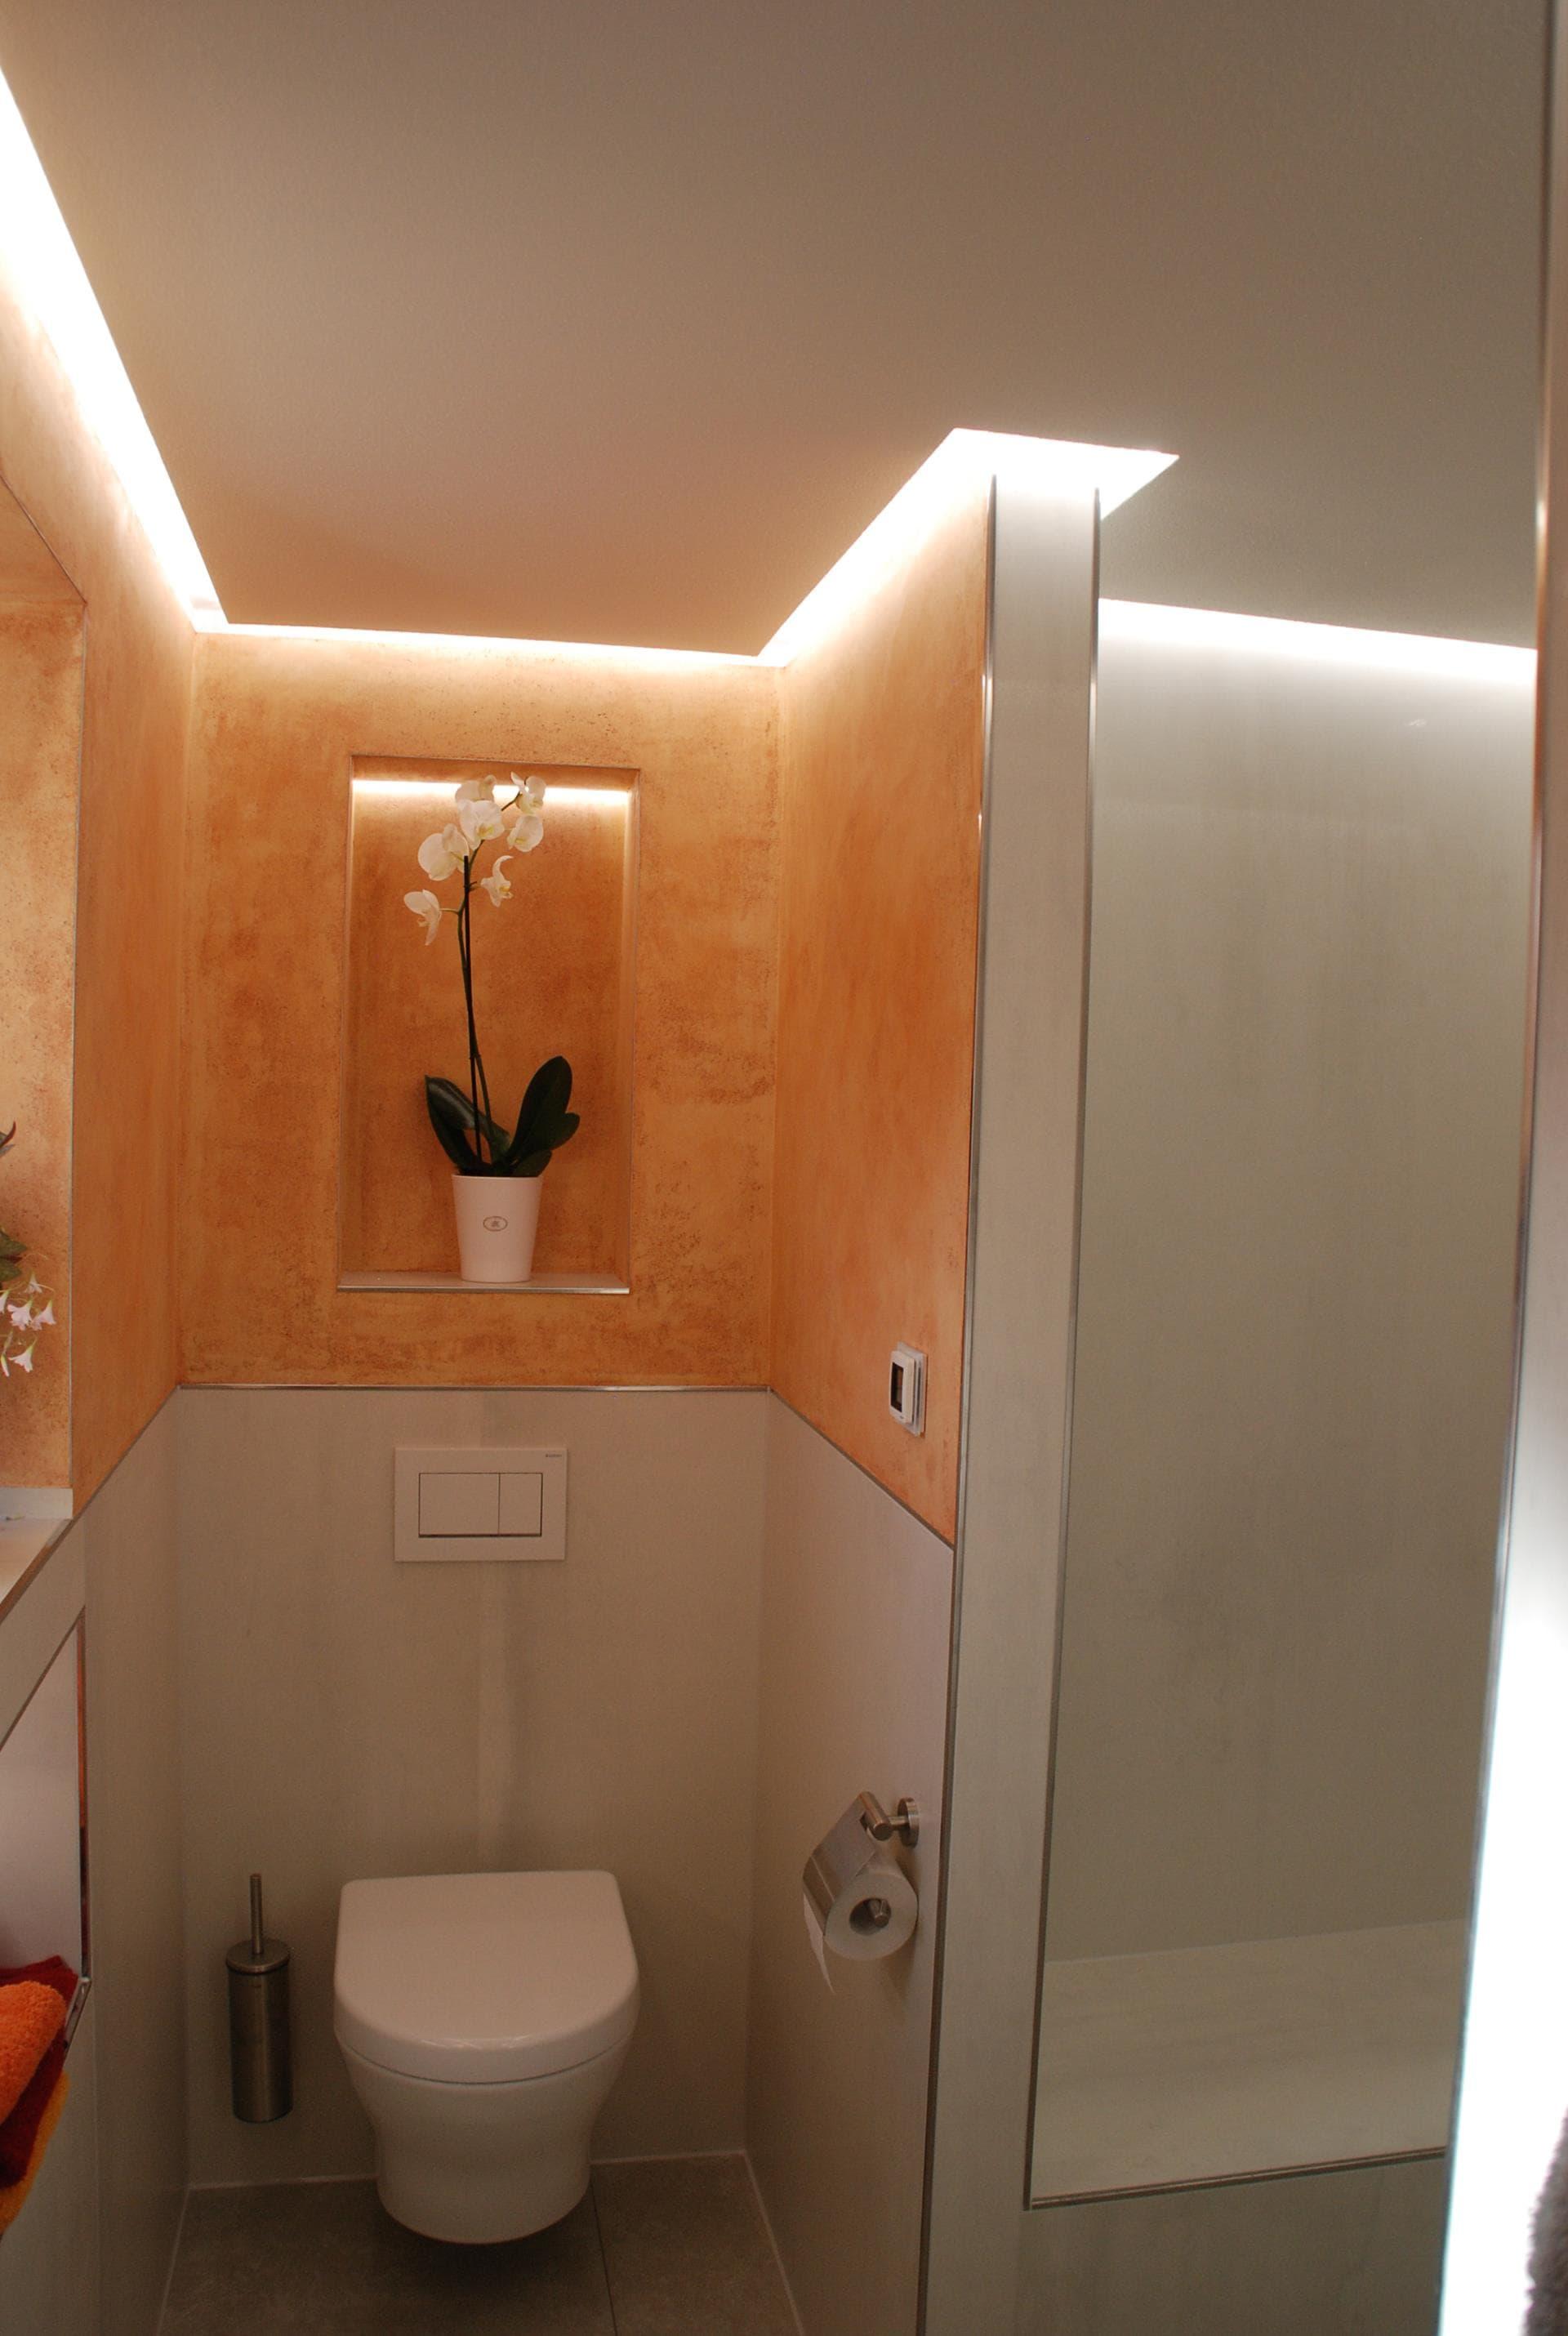 Kalkputz im Bad mit LED Beleuchtung - DER GESTALTUNGSMALER